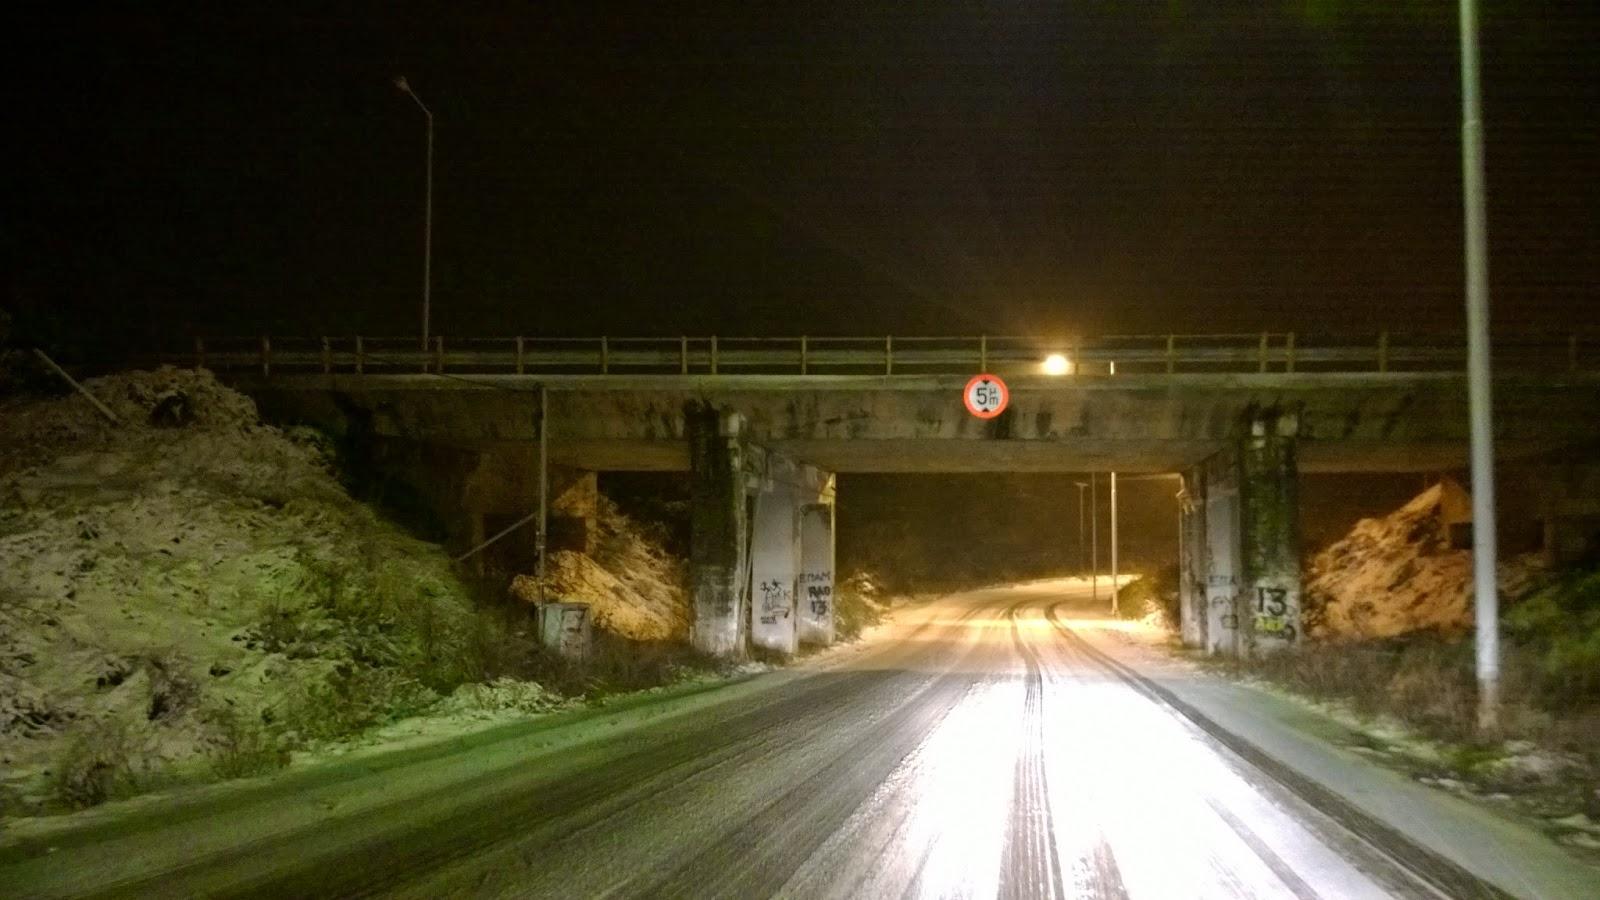 Kατάσταση στο οδικό δίκτυο της Περιφέρειας Δυτικής Μακεδονίας